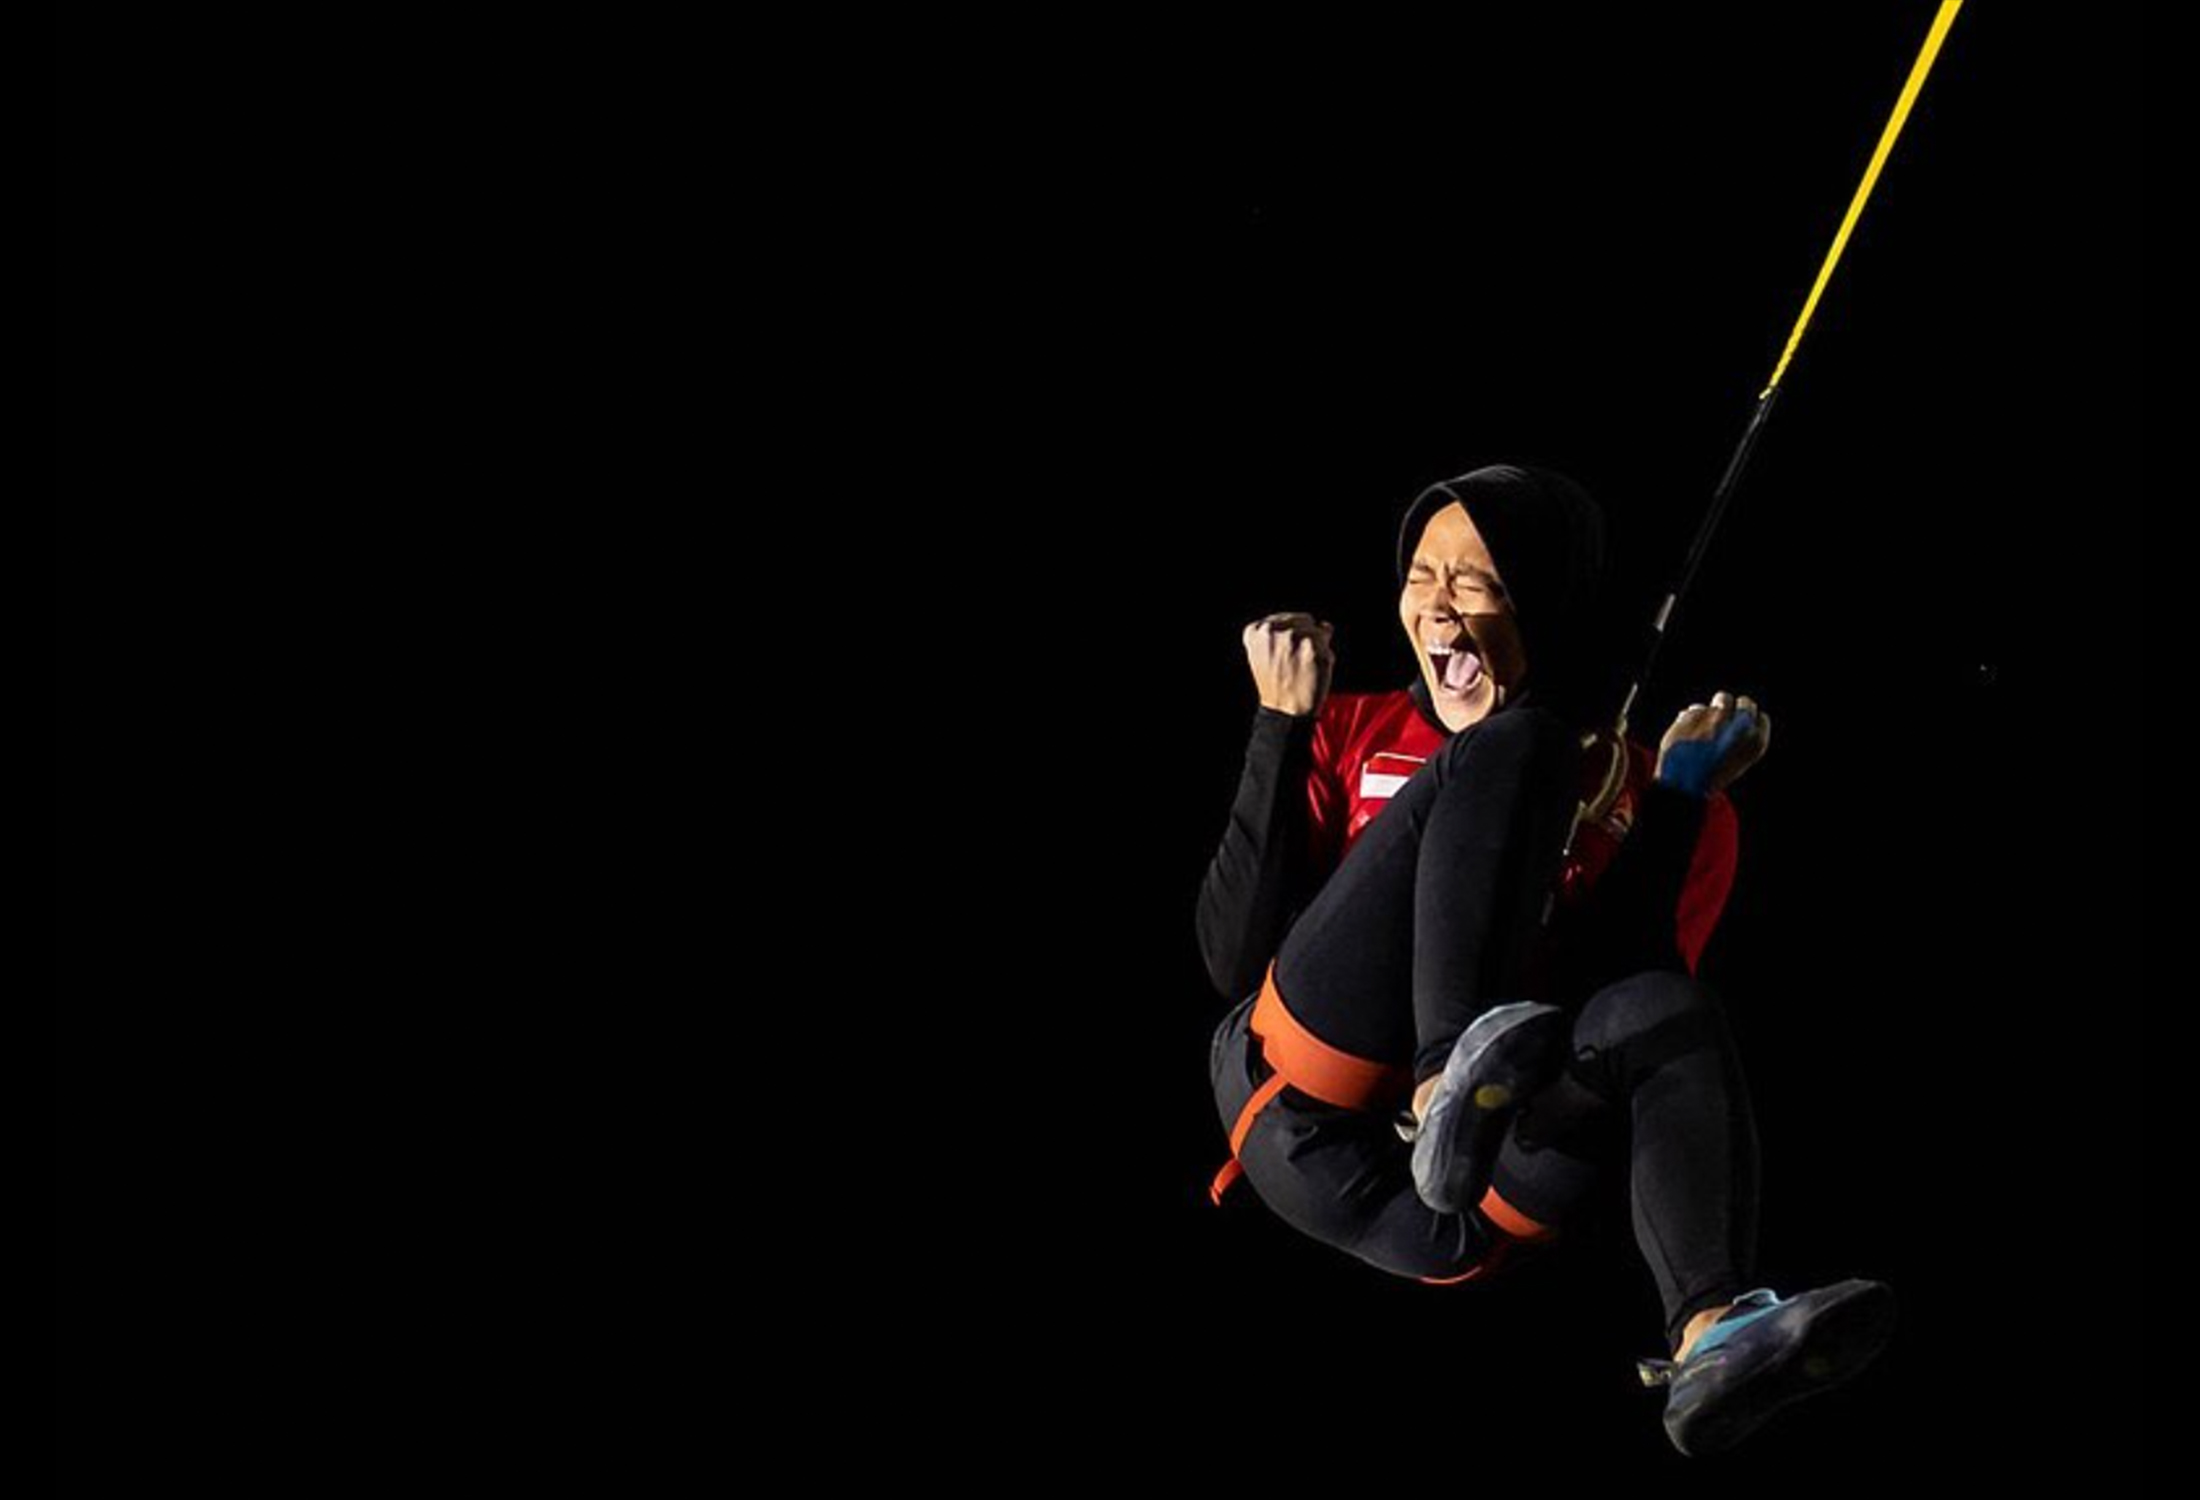 Aries Rahayu breaks world climbing speed record